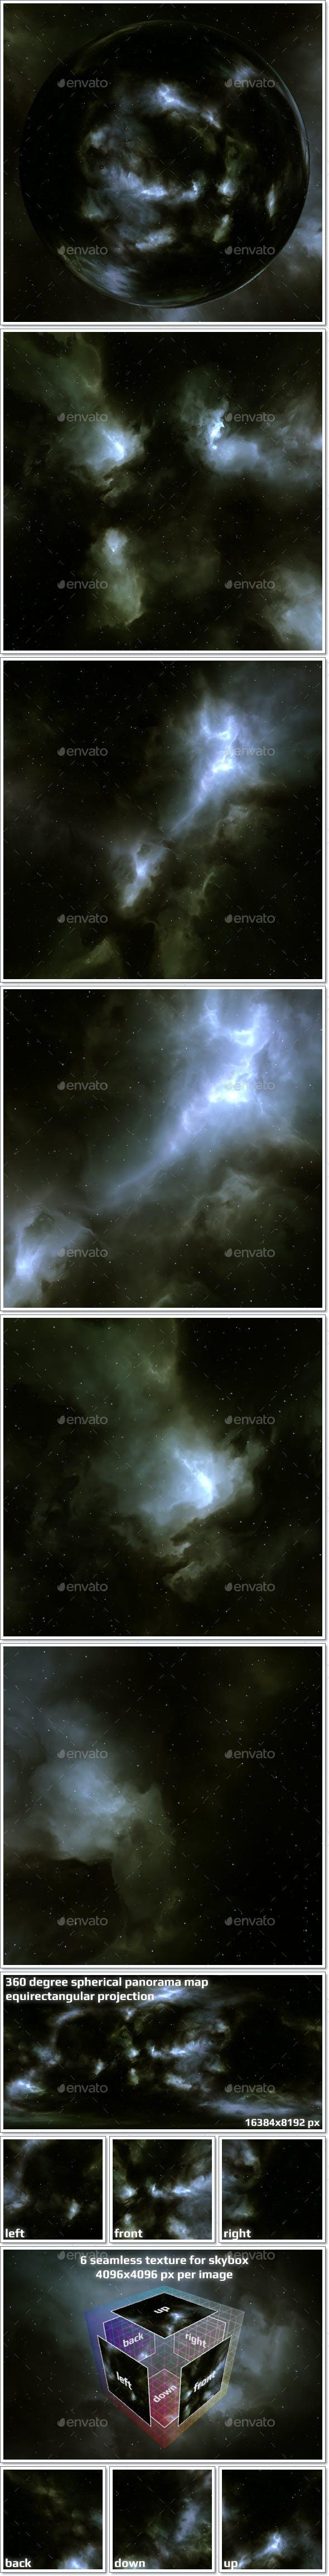 Nebula Space Environment HDRI Map 014 - 3DOcean Item for Sale